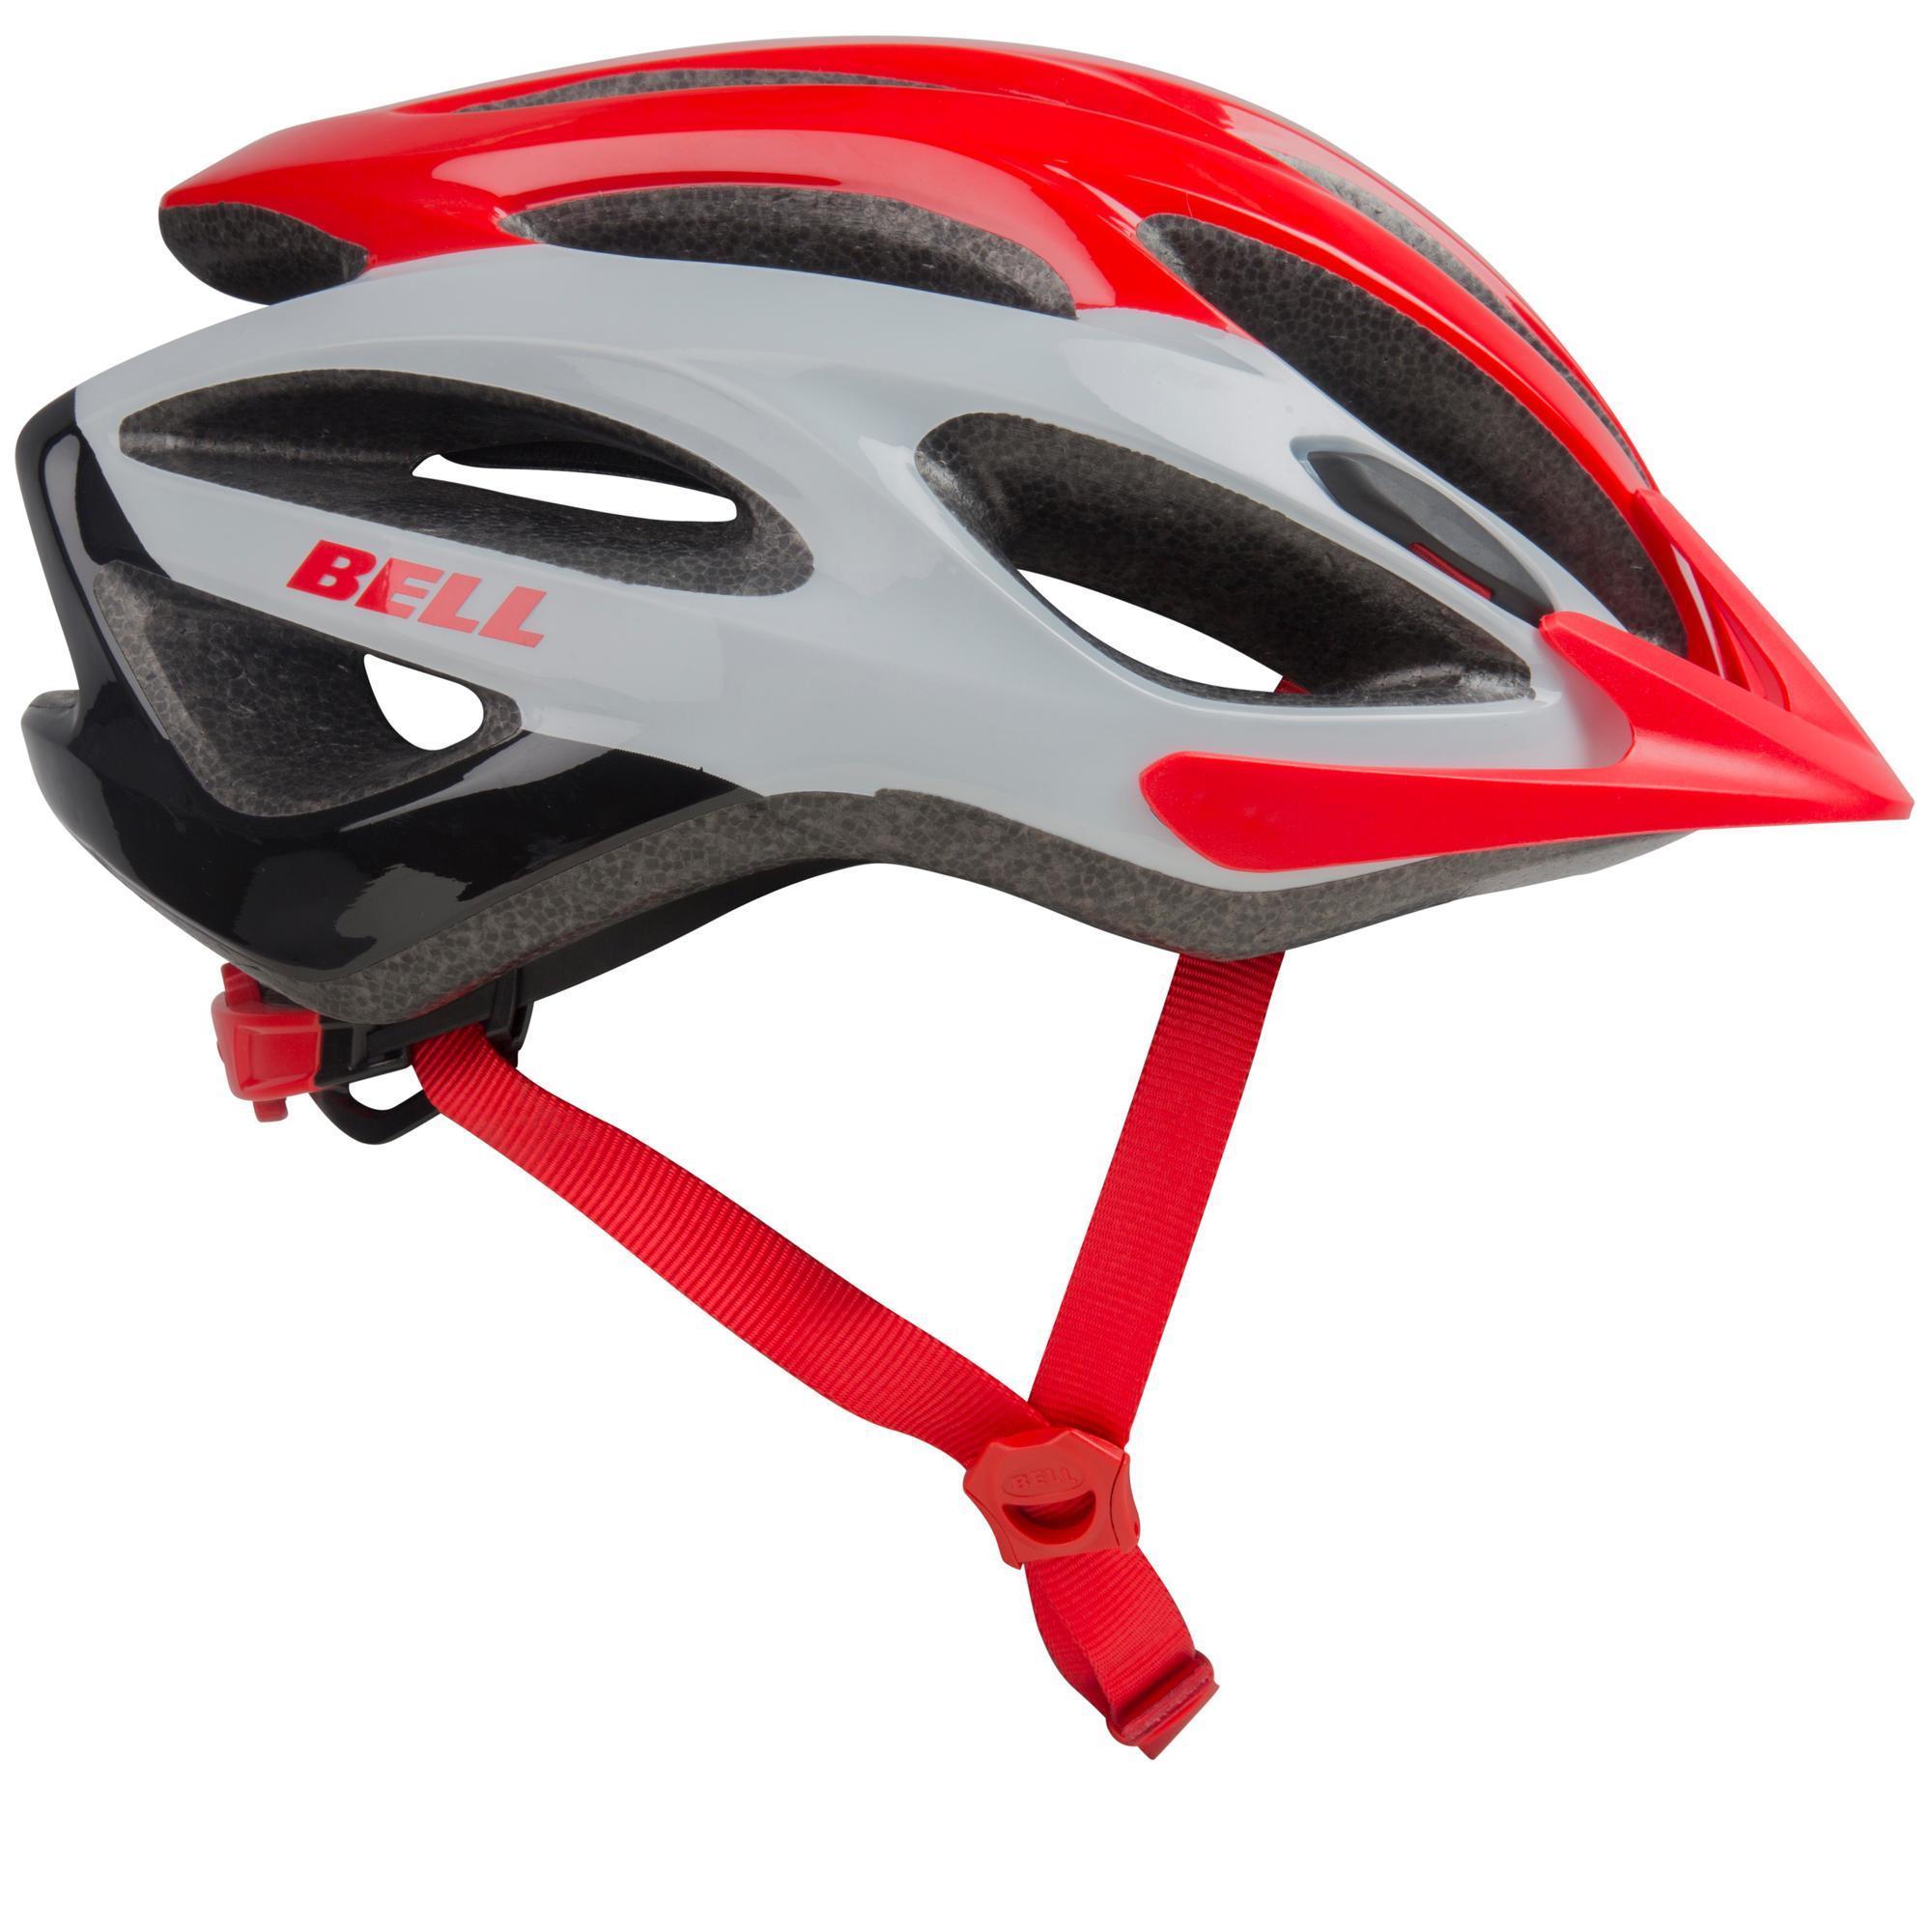 Bell MTB-helm Paradox rood/wit/zwart kopen